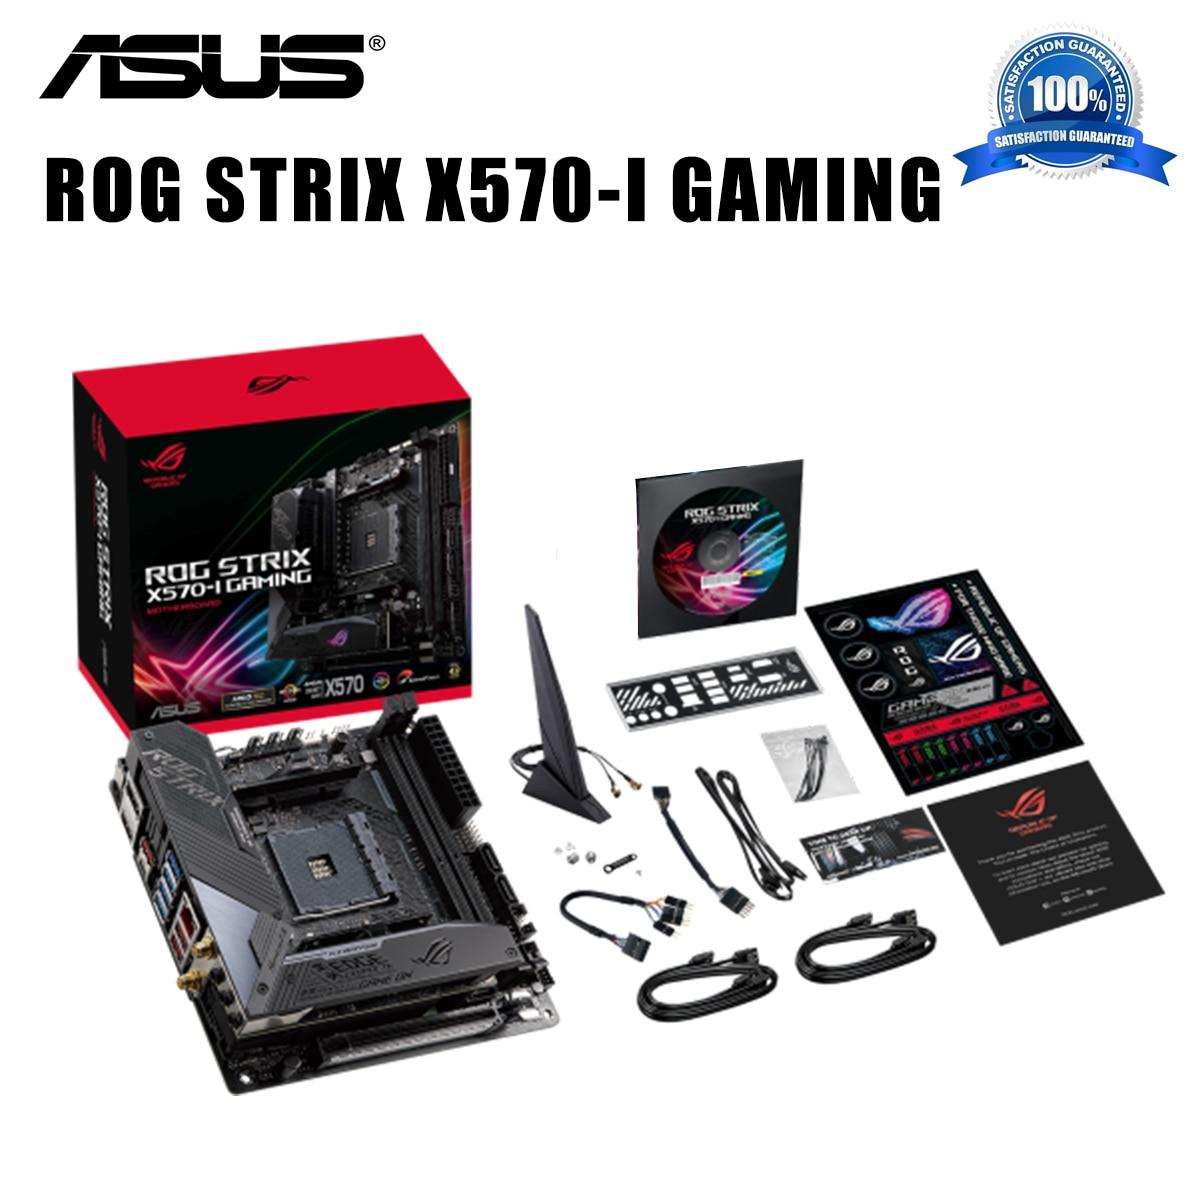 Socket AM4 Asus ROG STRIX X570-I GAMING Motherboard DDR4 64GB PCI-E 4.0 DDR4 AMD Ryzen PC X570 Gaming Placa-mãe AM4 Mini-ITX